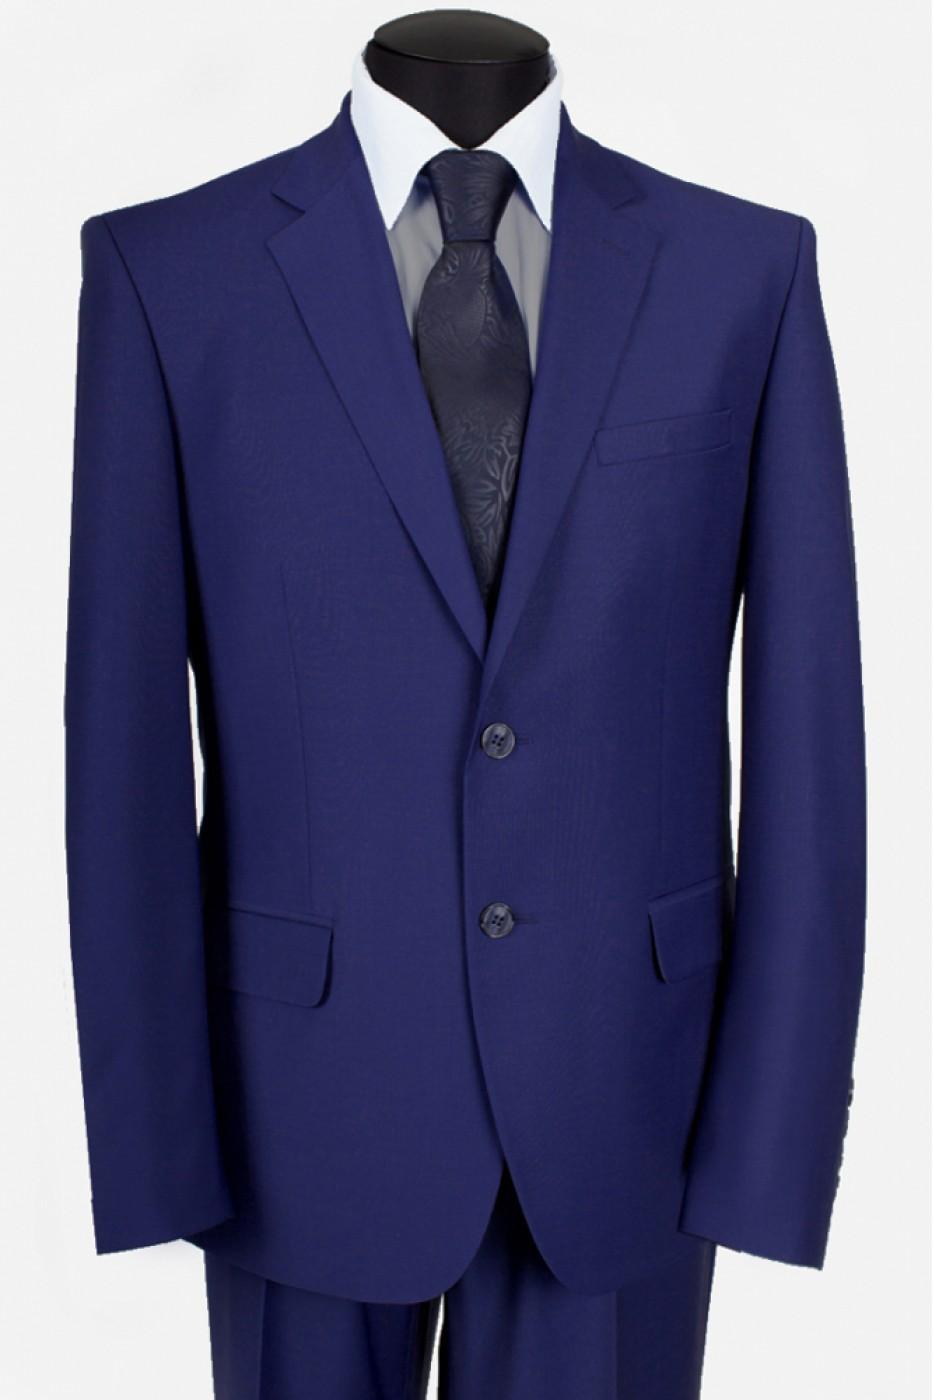 Тёмно-синий мужской костюм 5421*M POINT LUX